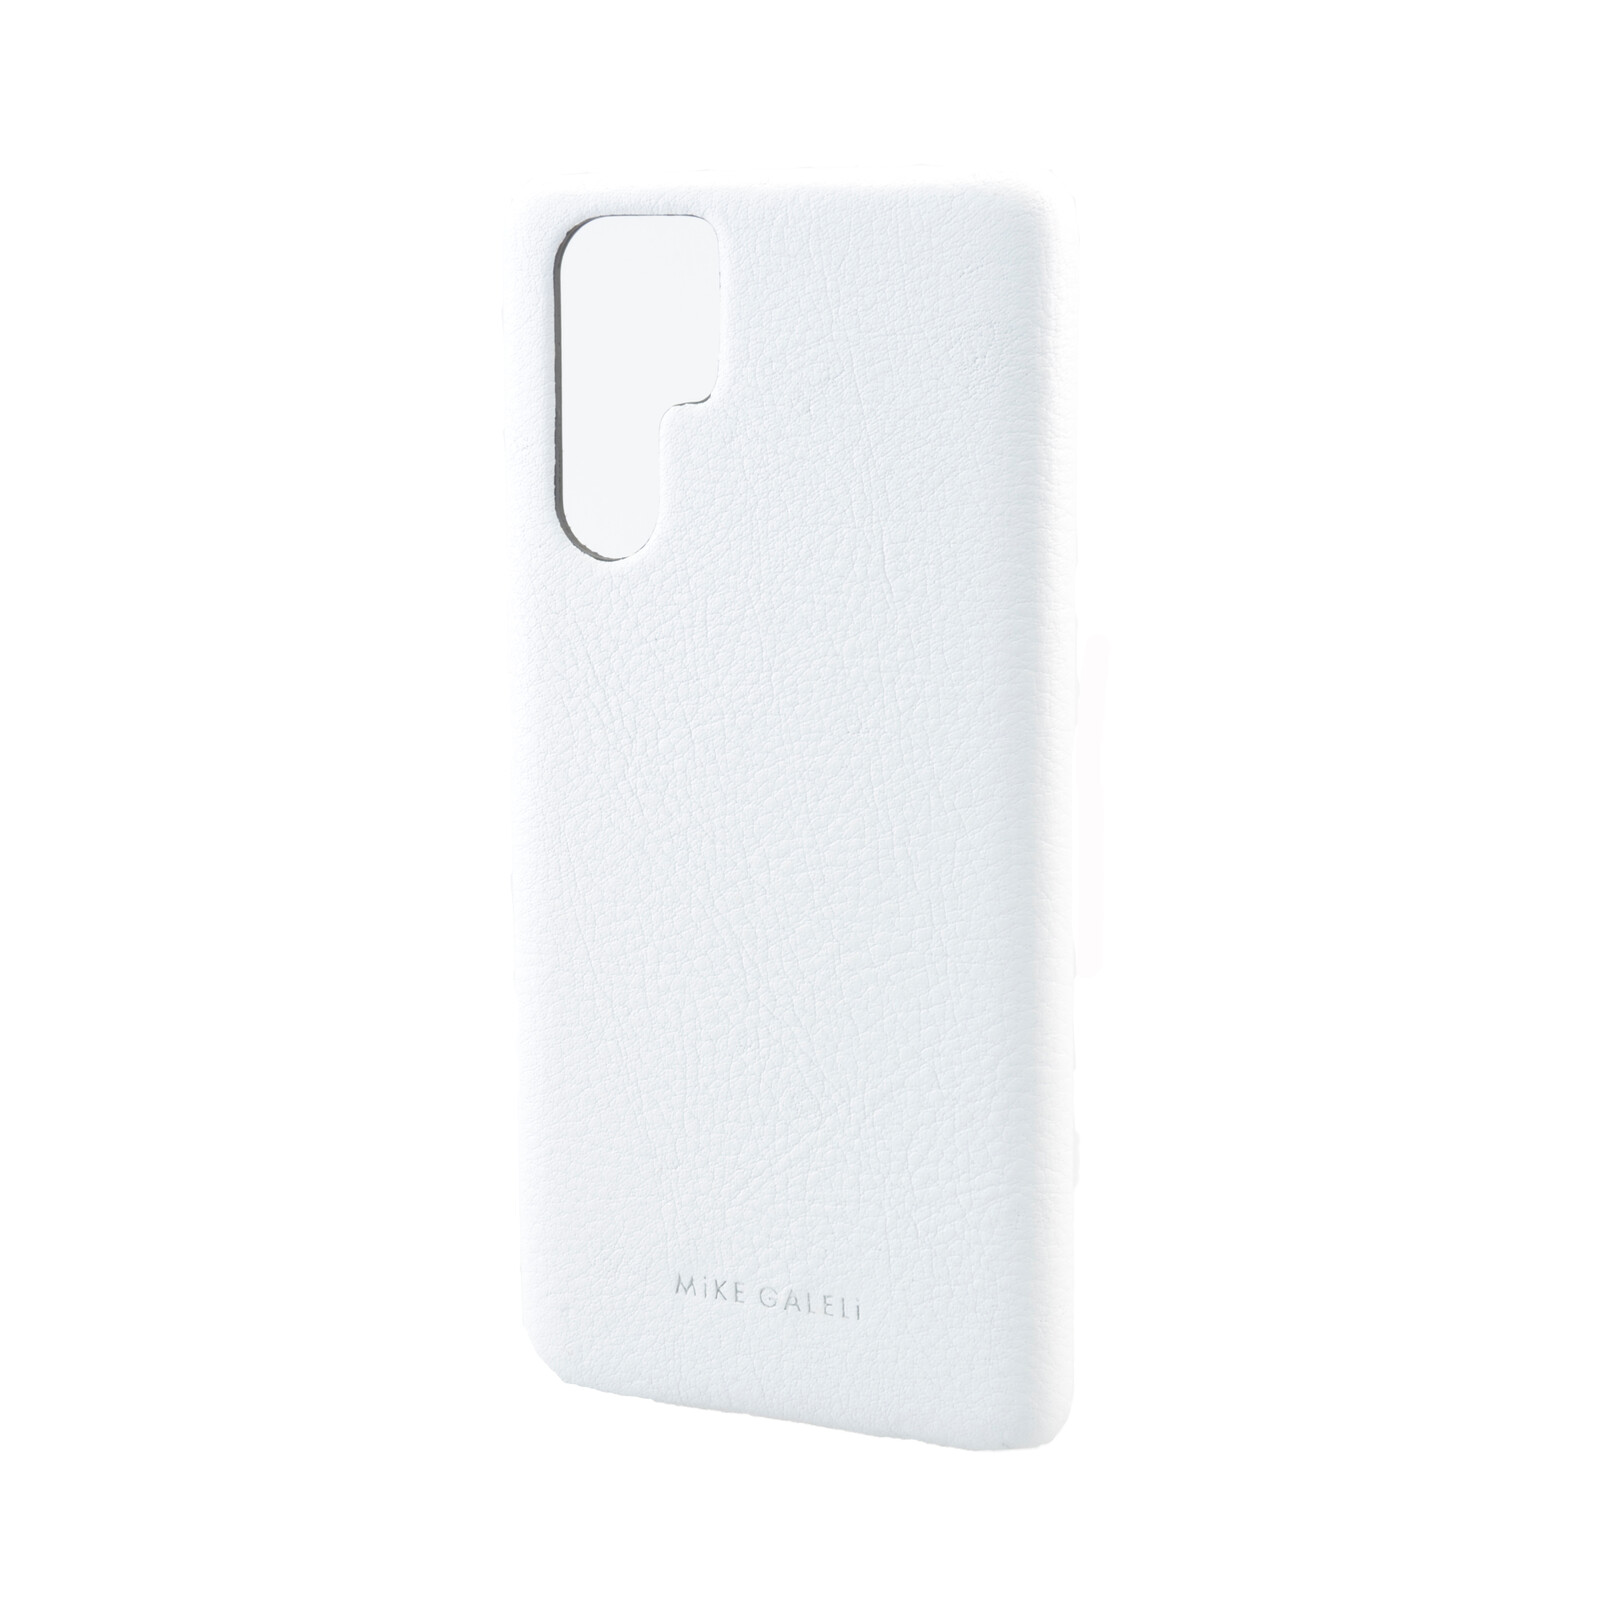 Galeli Back Cover LENNY Huawei P30 Pro weiß